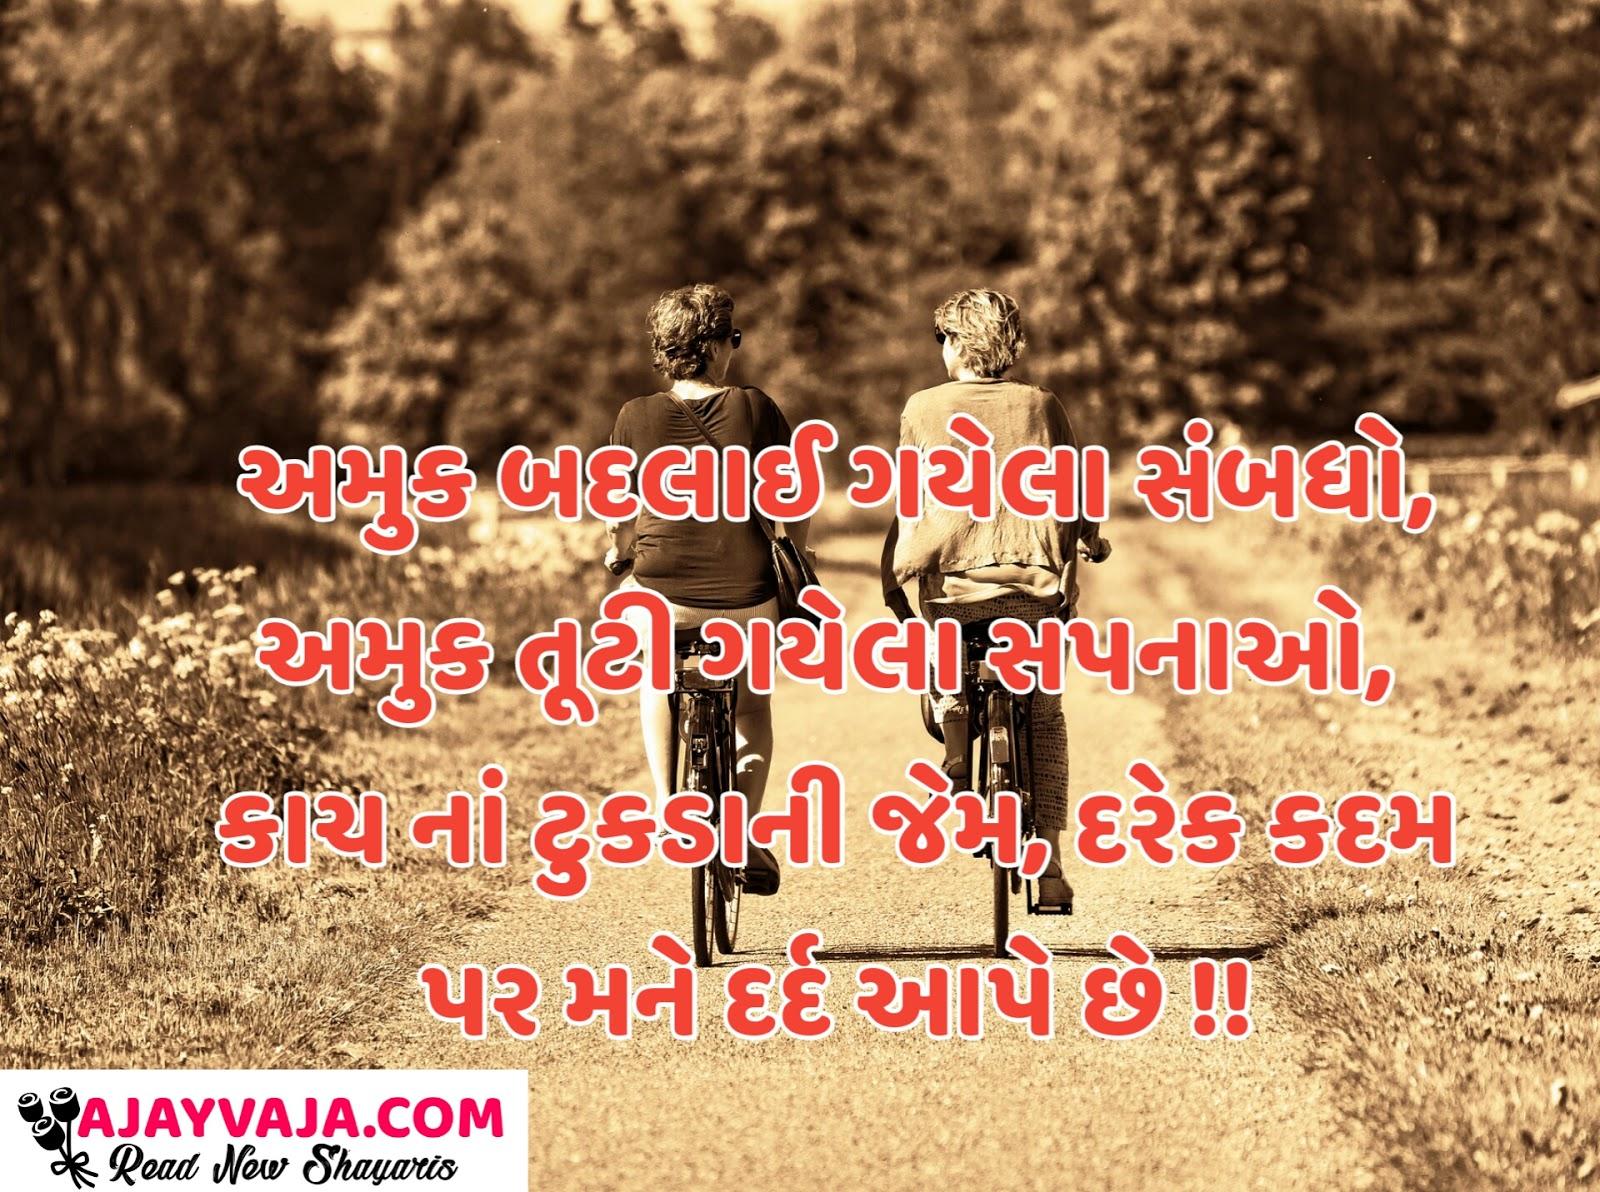 Best images in Gujarati